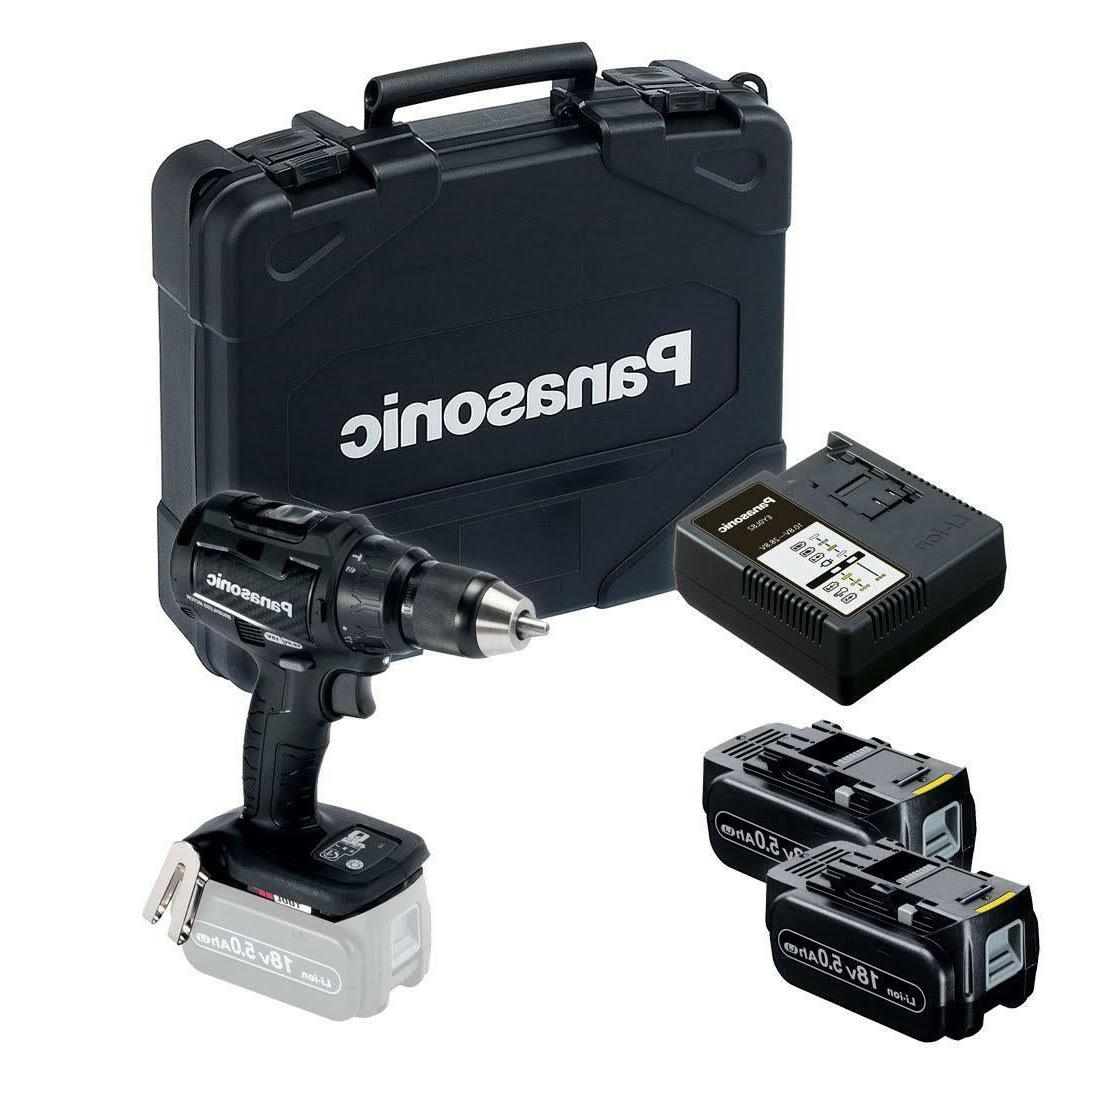 Panasonic Dual Voltage 14.4v/18v inc